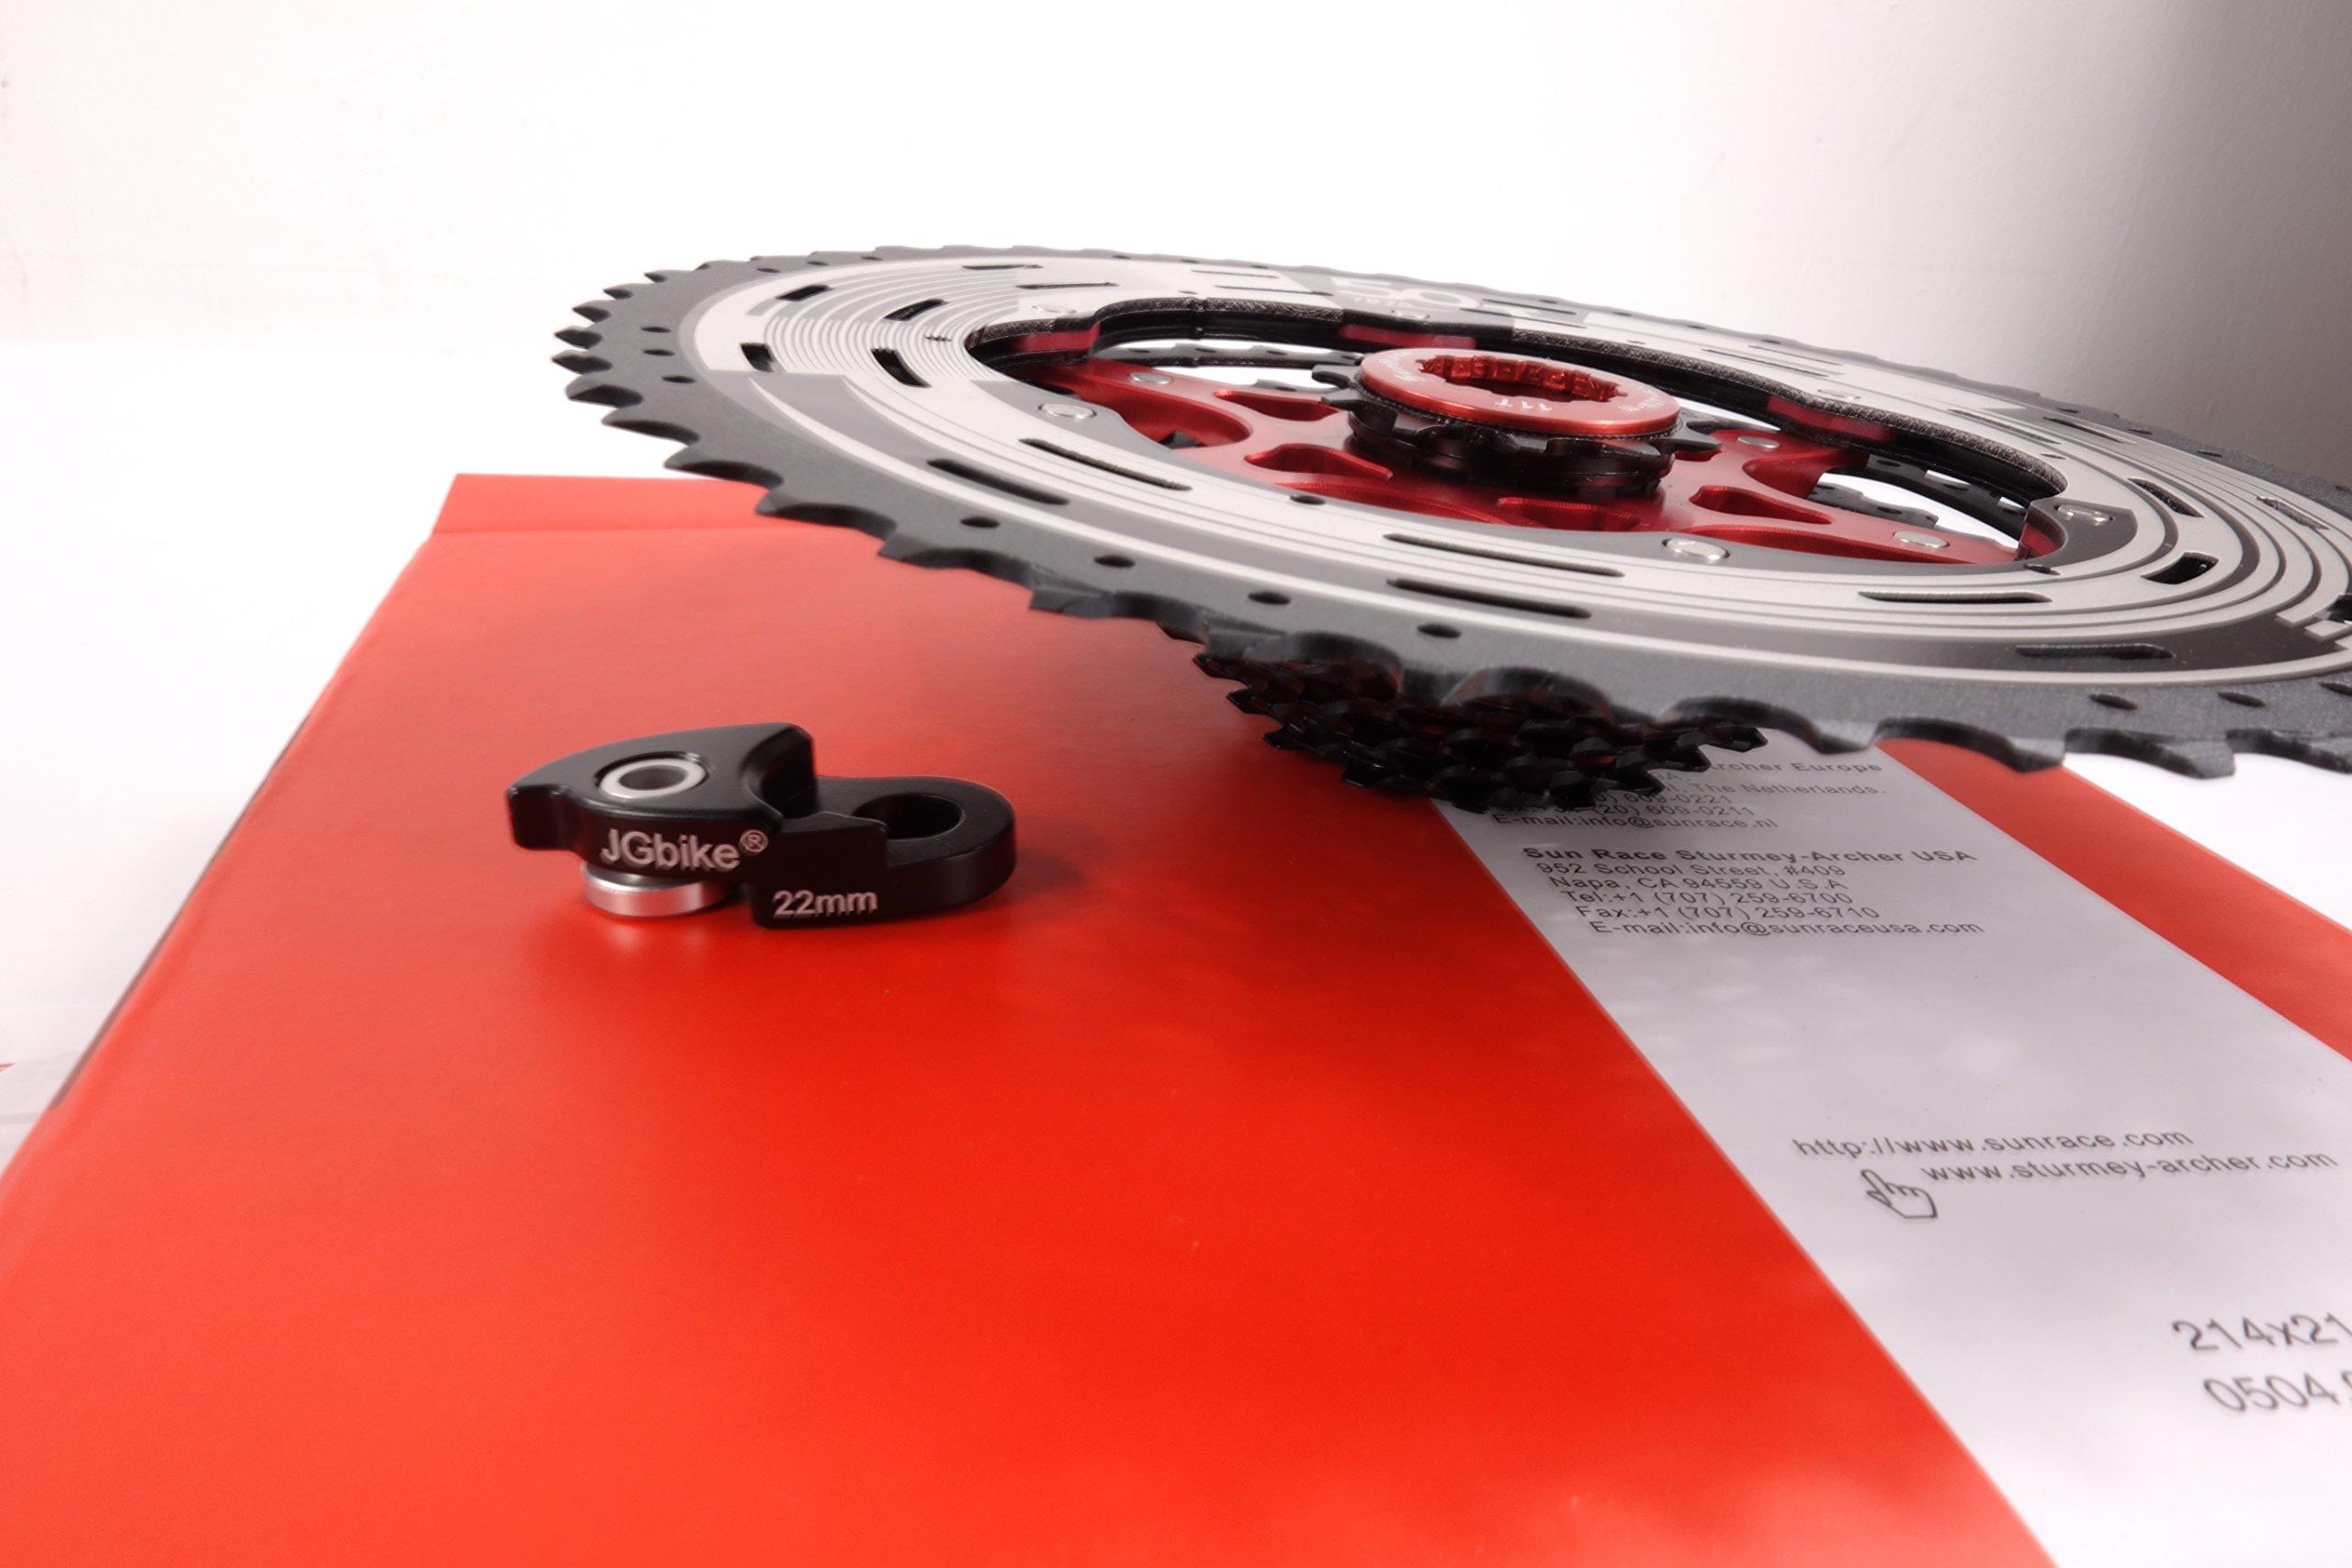 Sunrace 12-speed 11-50T cassette freewheel CSMZ90 WA5 wide ratio MTB in Black with RD extender by JGbike (Image #6)